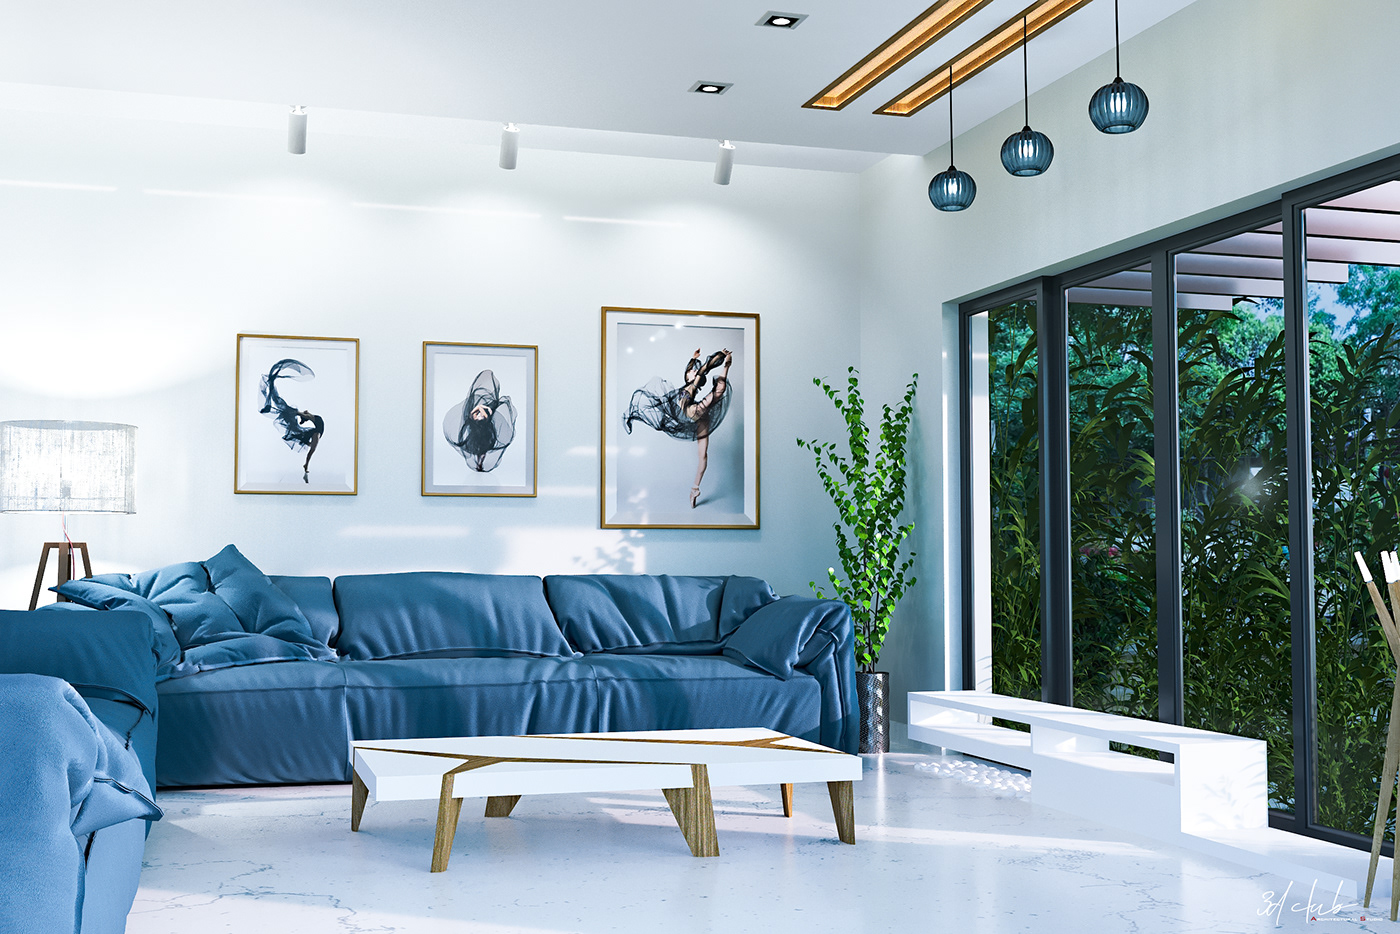 architecture corona Interior living room